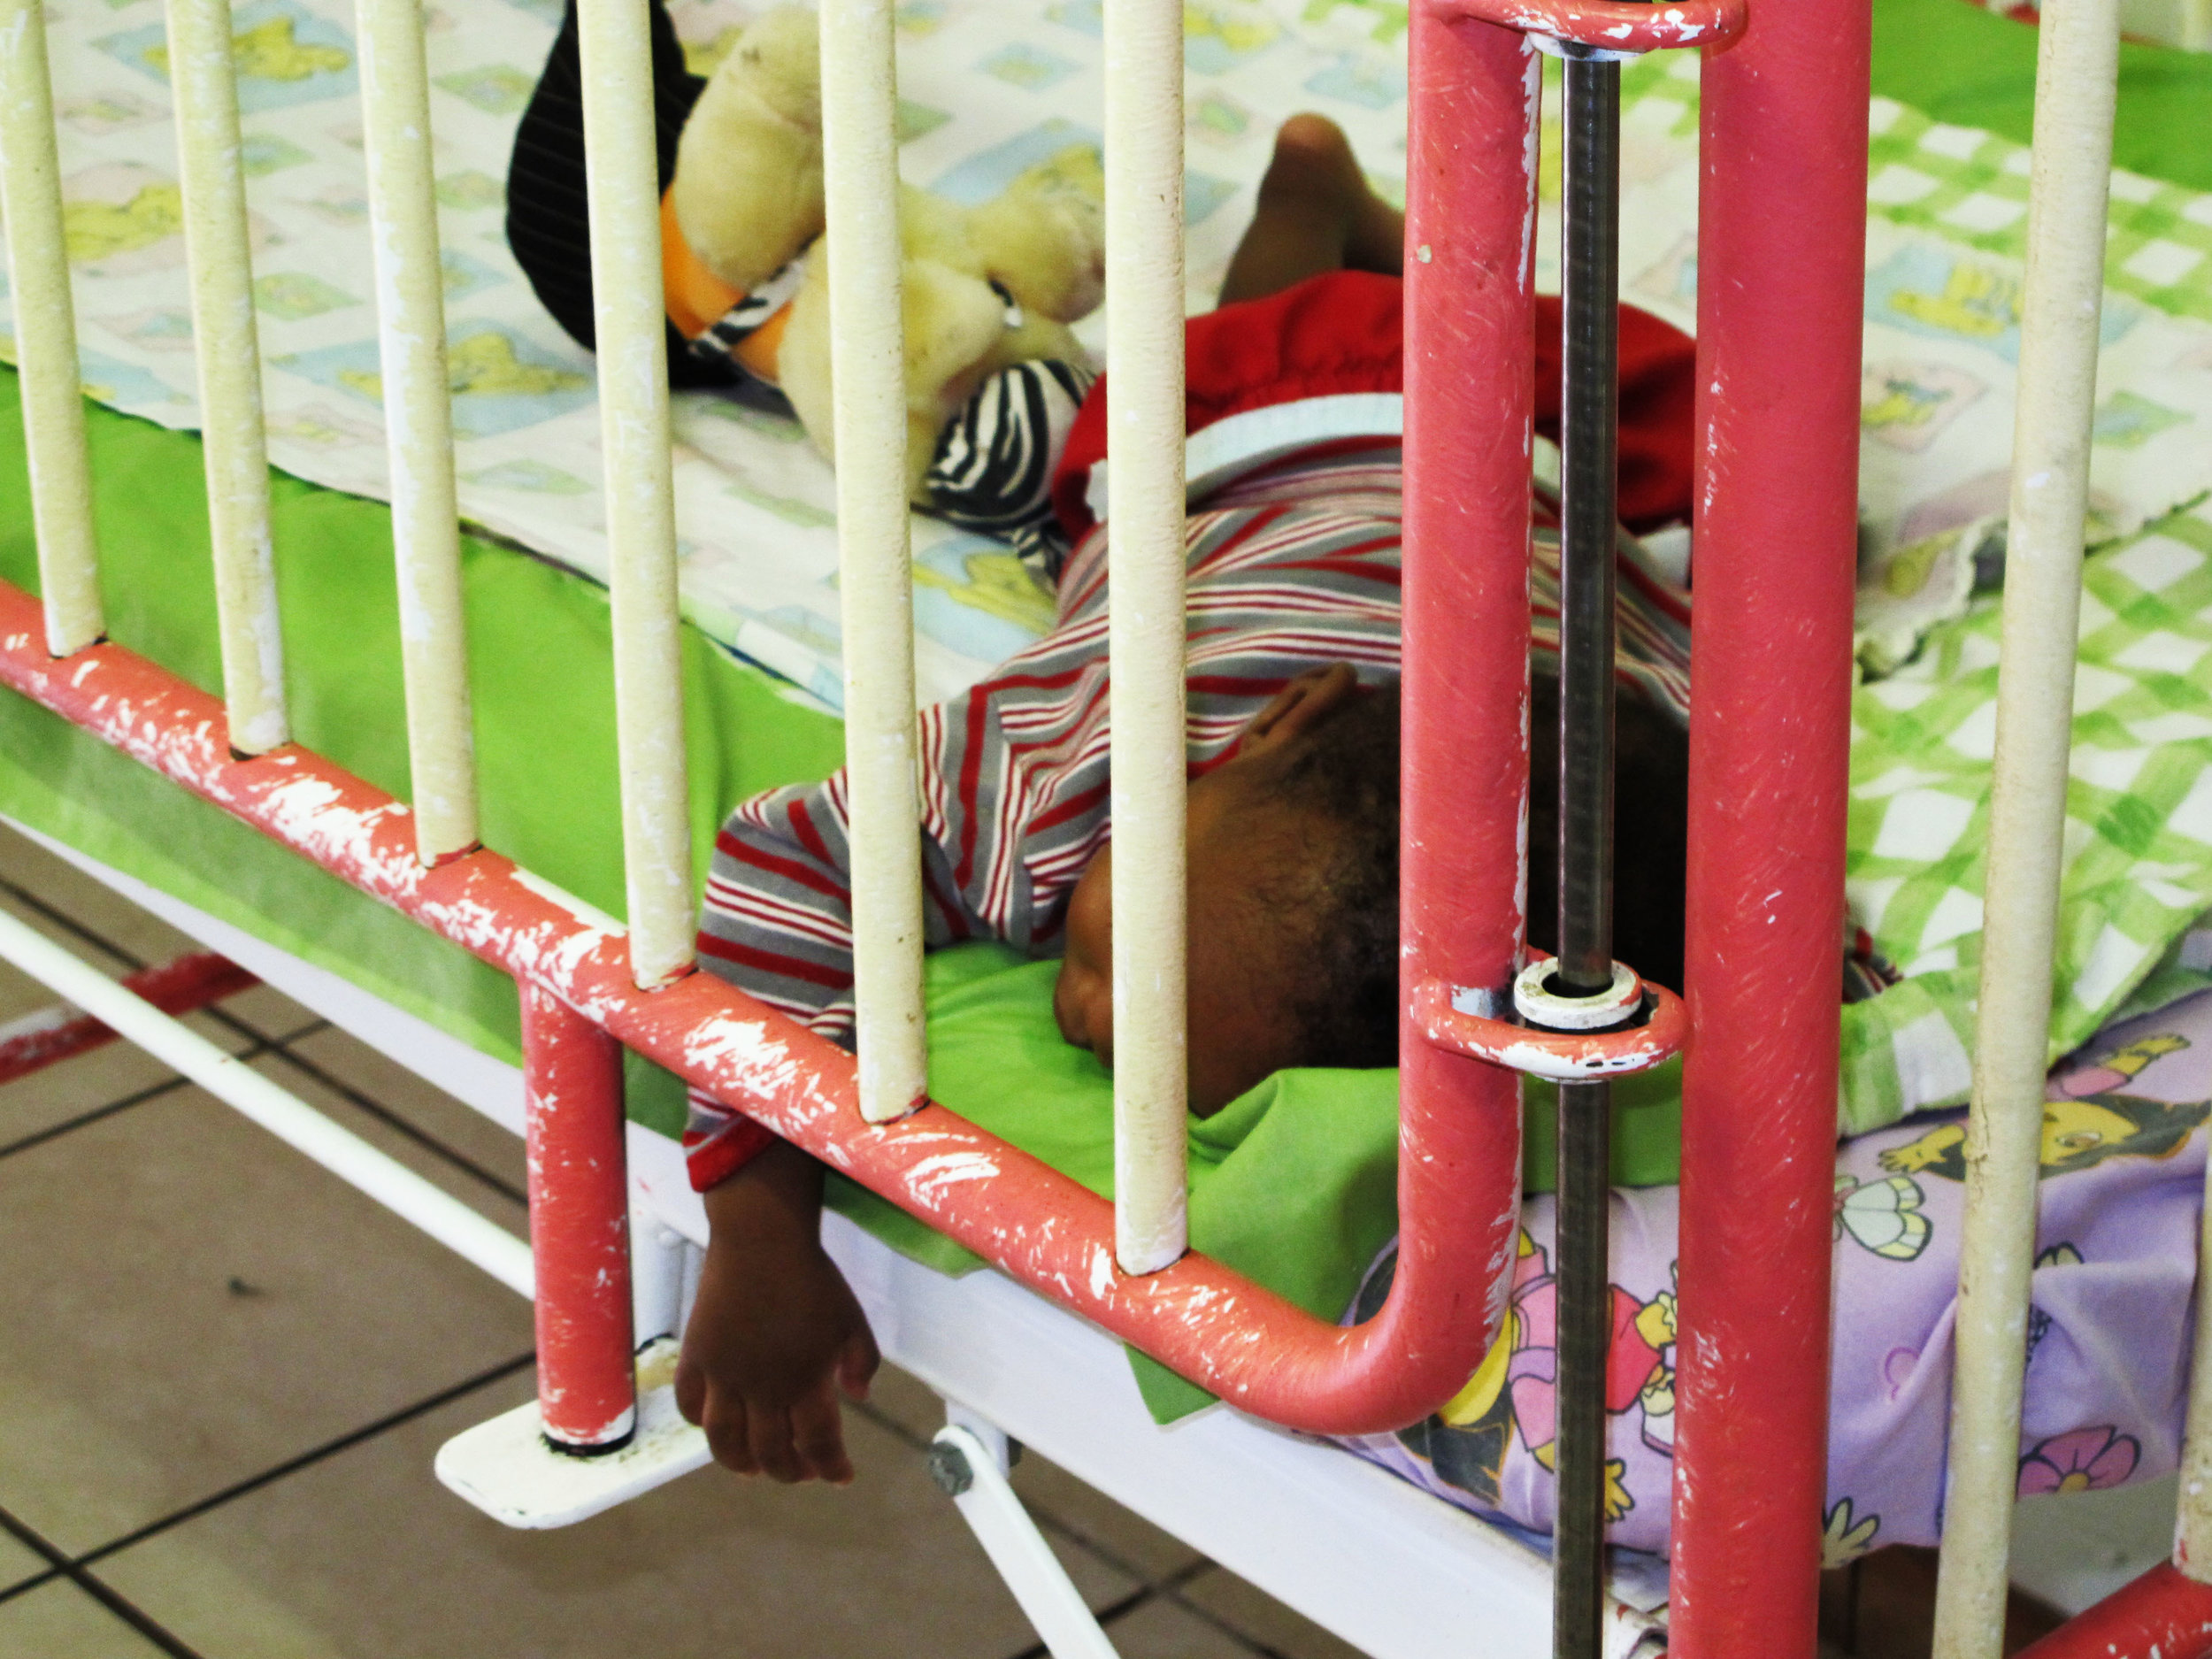 South Africa orphanage crib